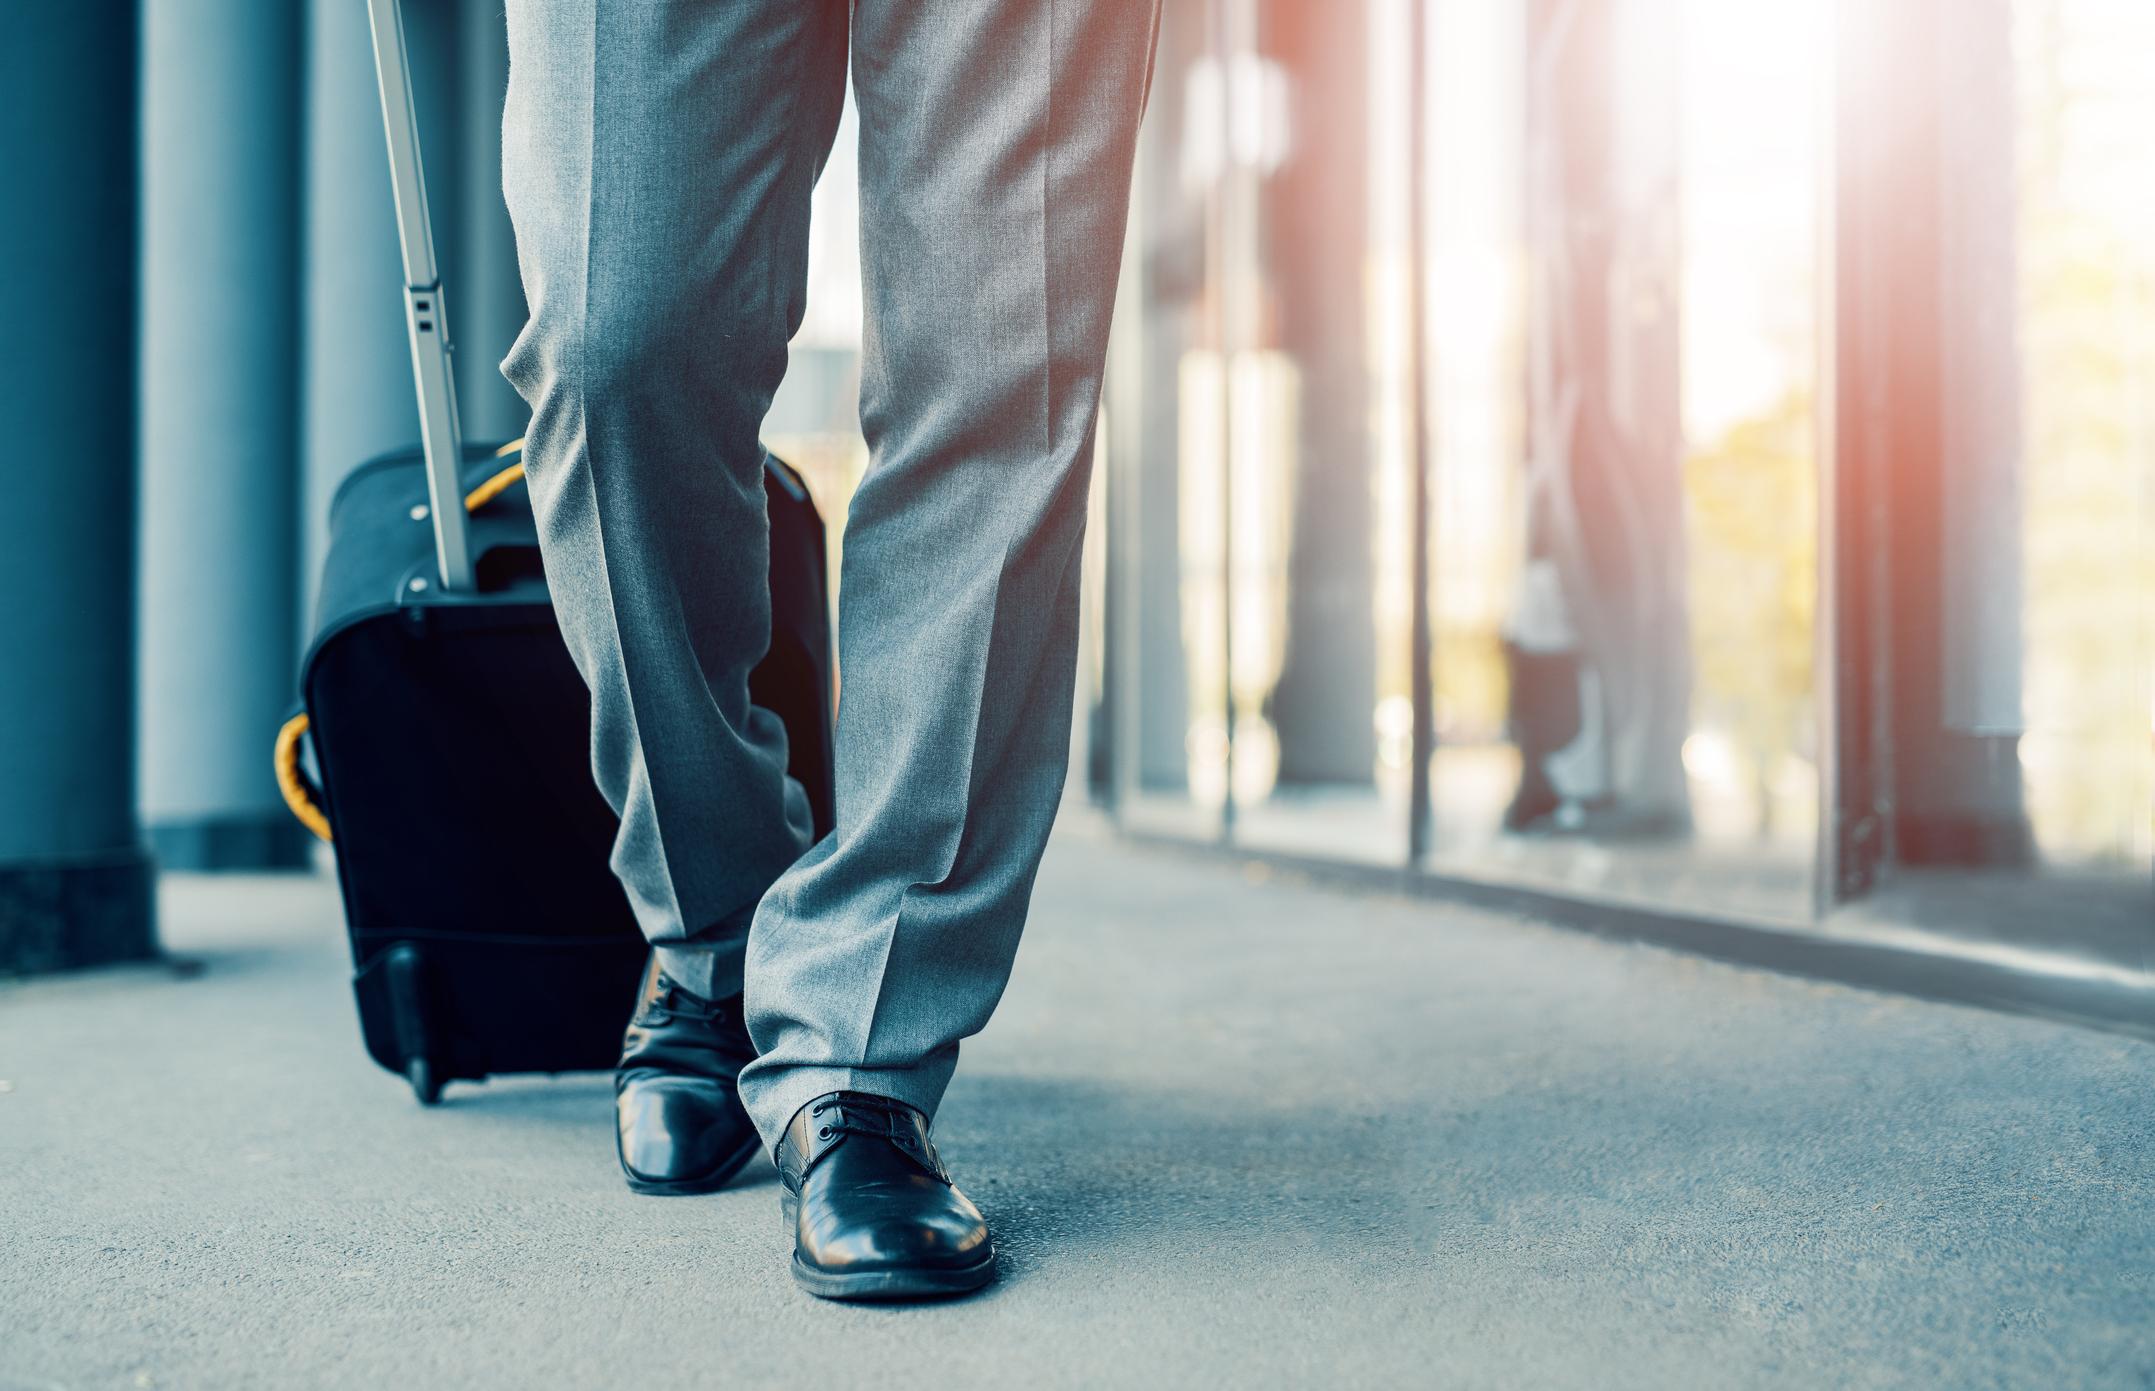 Man pulling suitcase